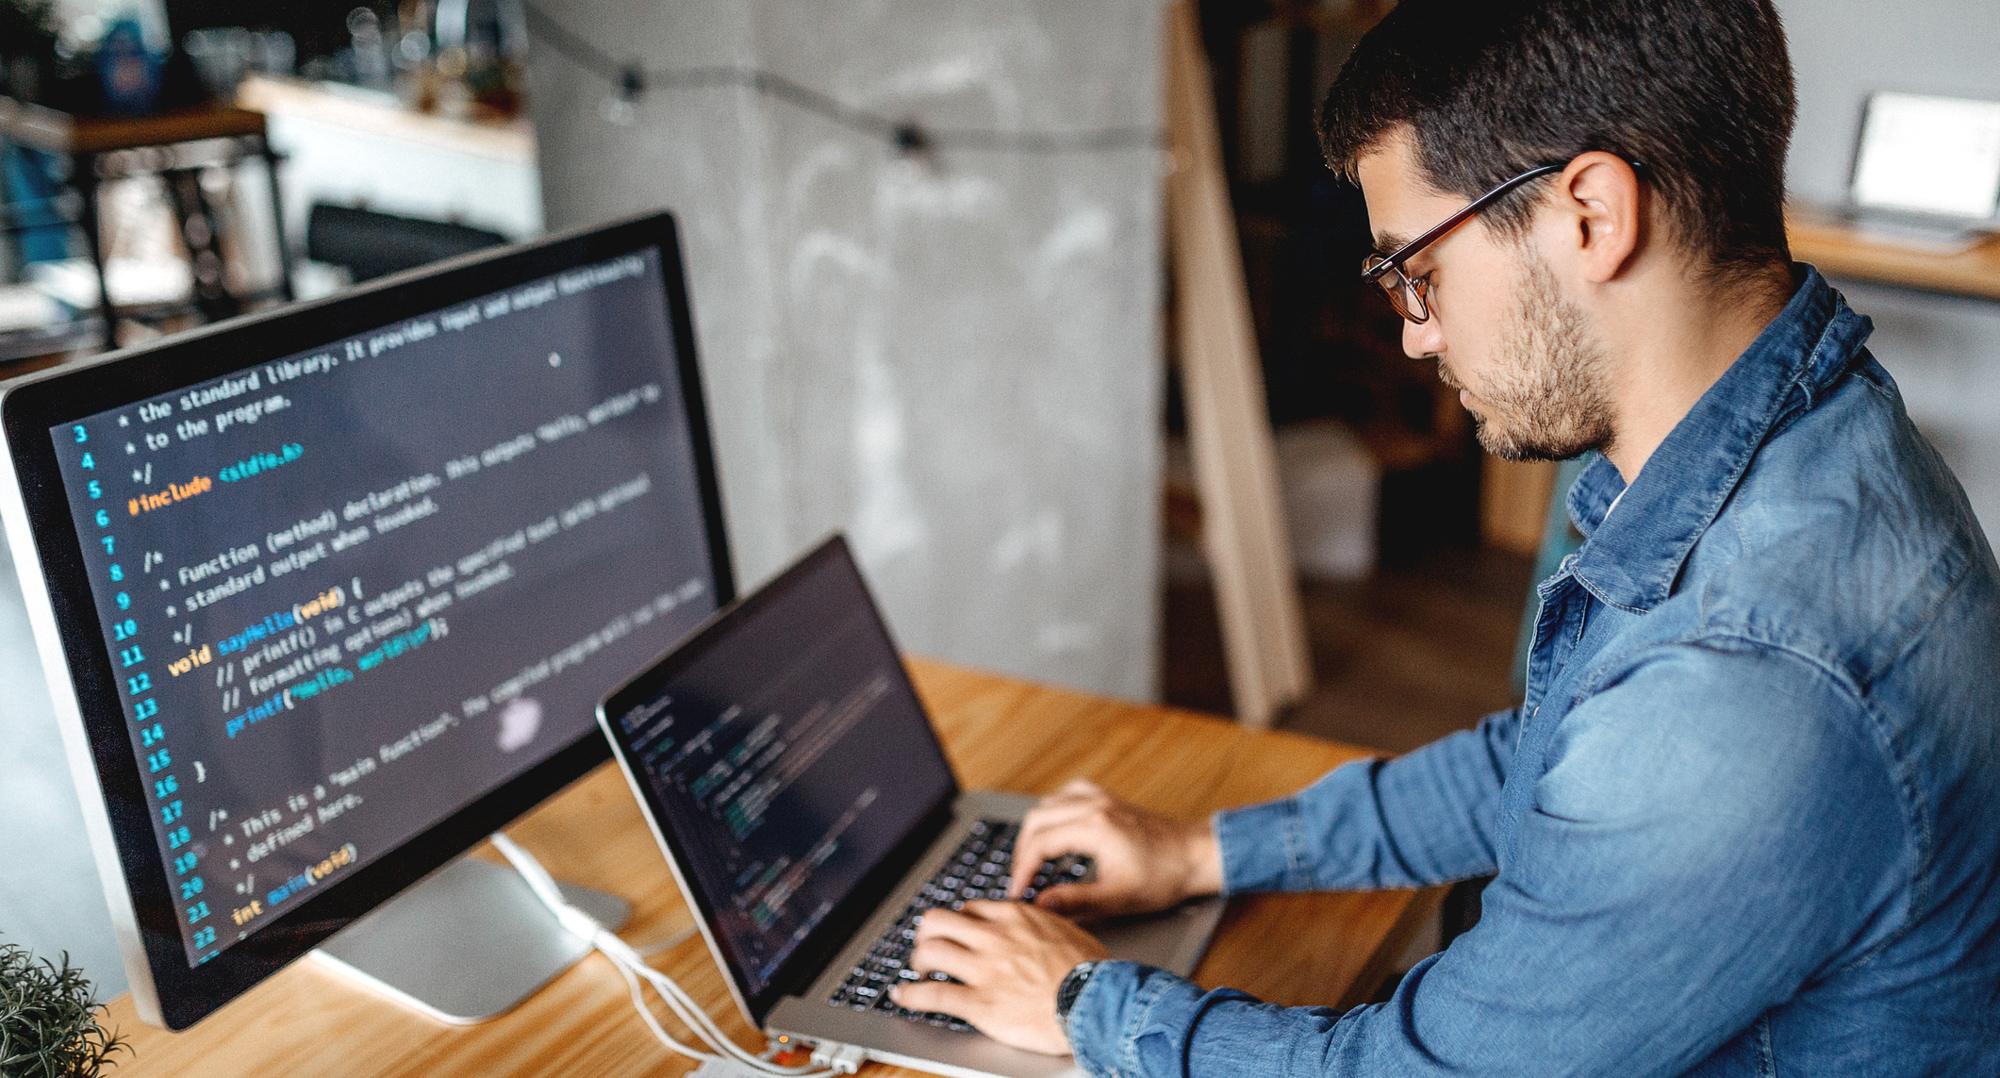 Image of man sitting at desk typing on laptop - iStock image